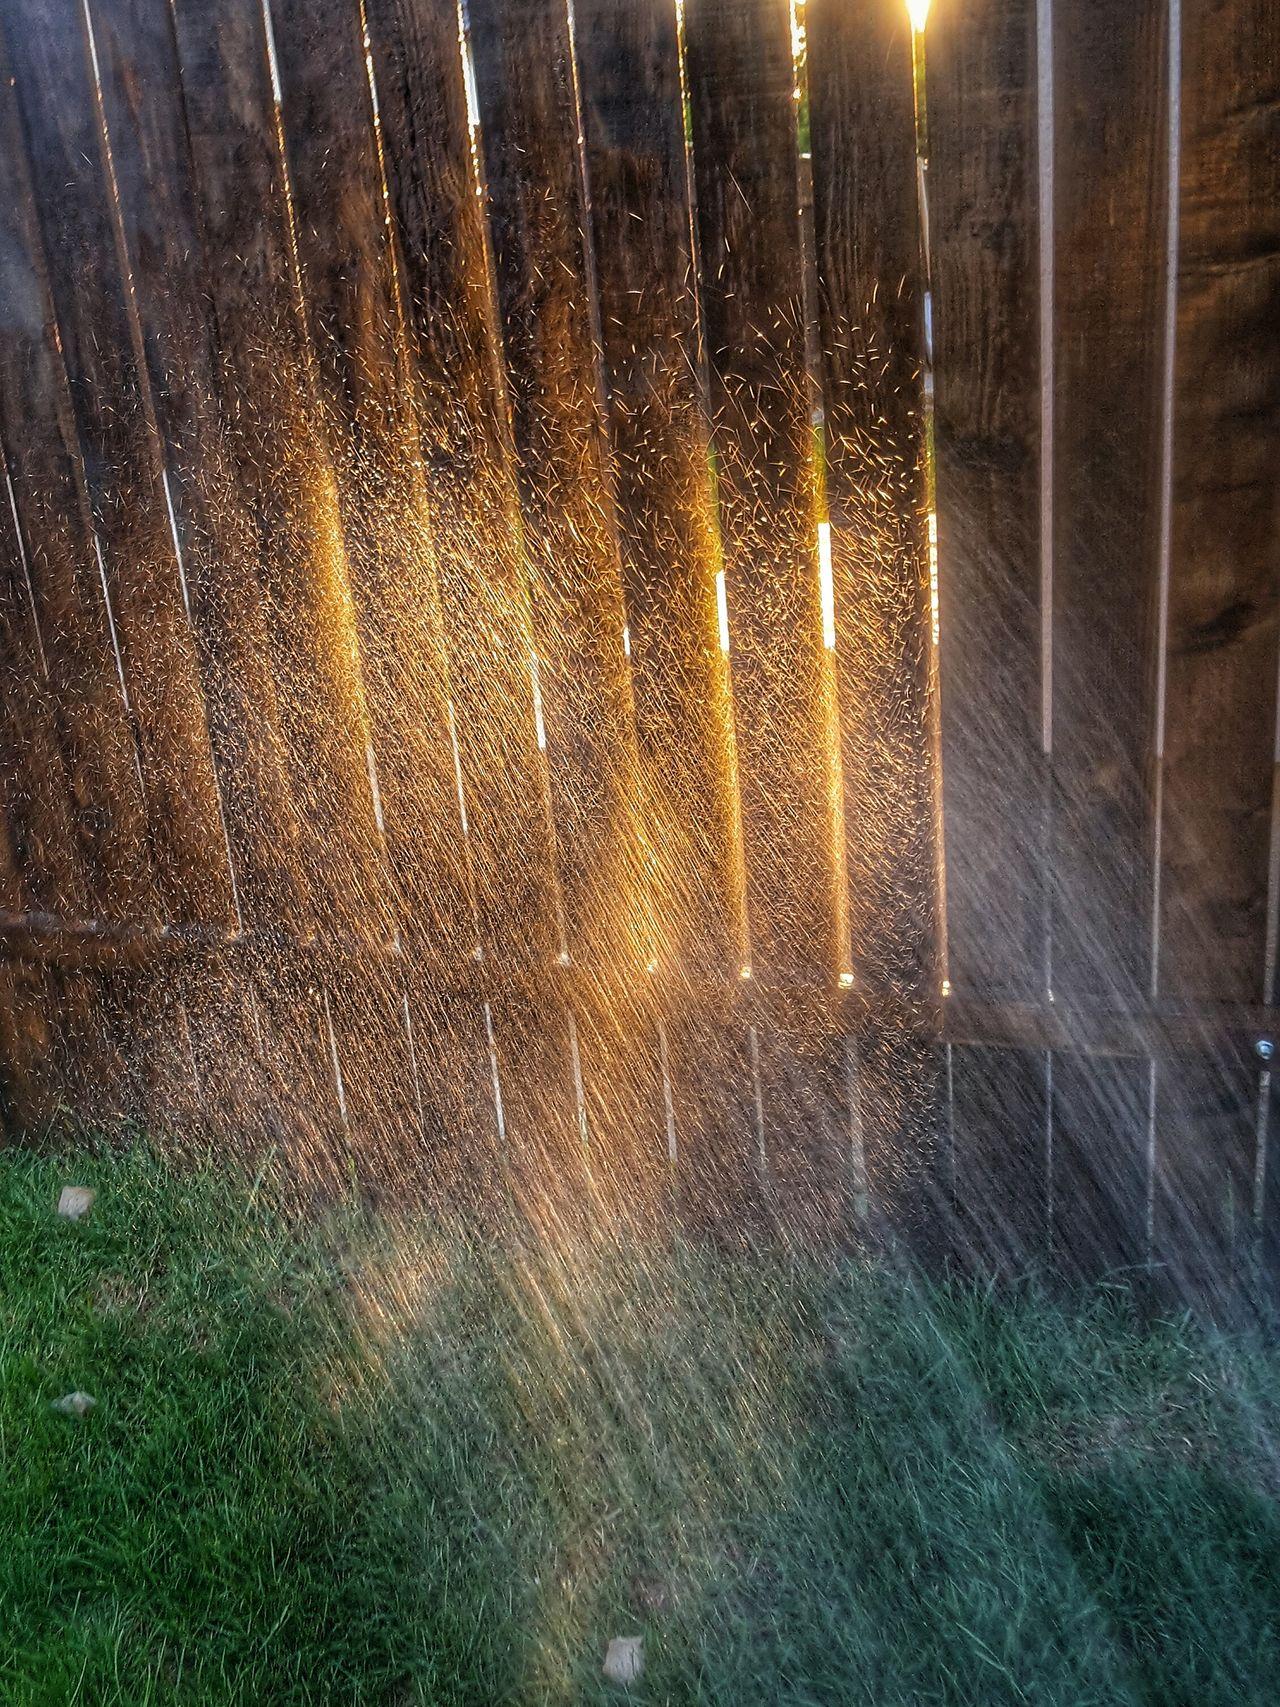 Water, Splash, Waterdrops, Sunset, Light, Nature, Grass, Outdoor, Illuminated, Glowing, Sunbeam